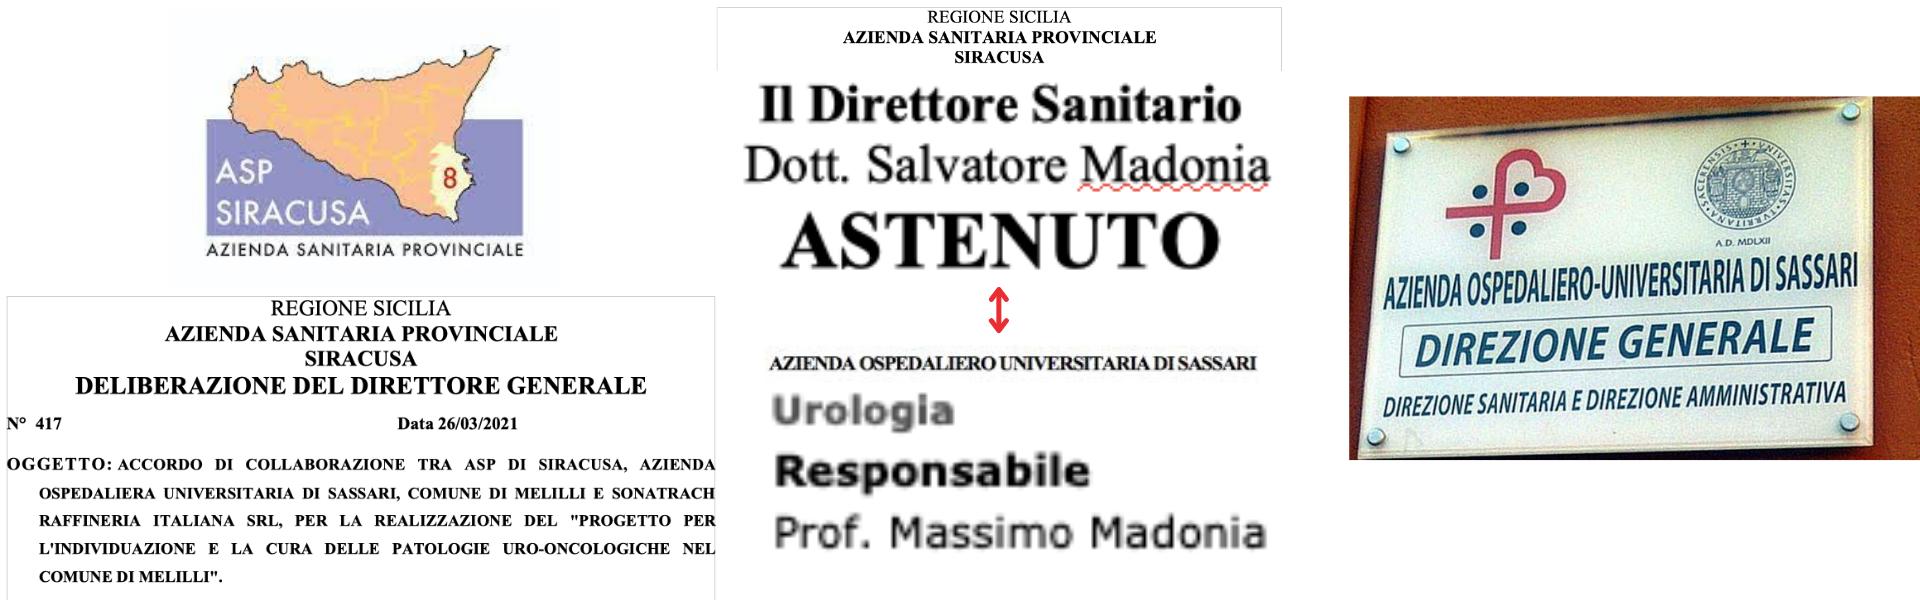 sassari2-1618510392.png